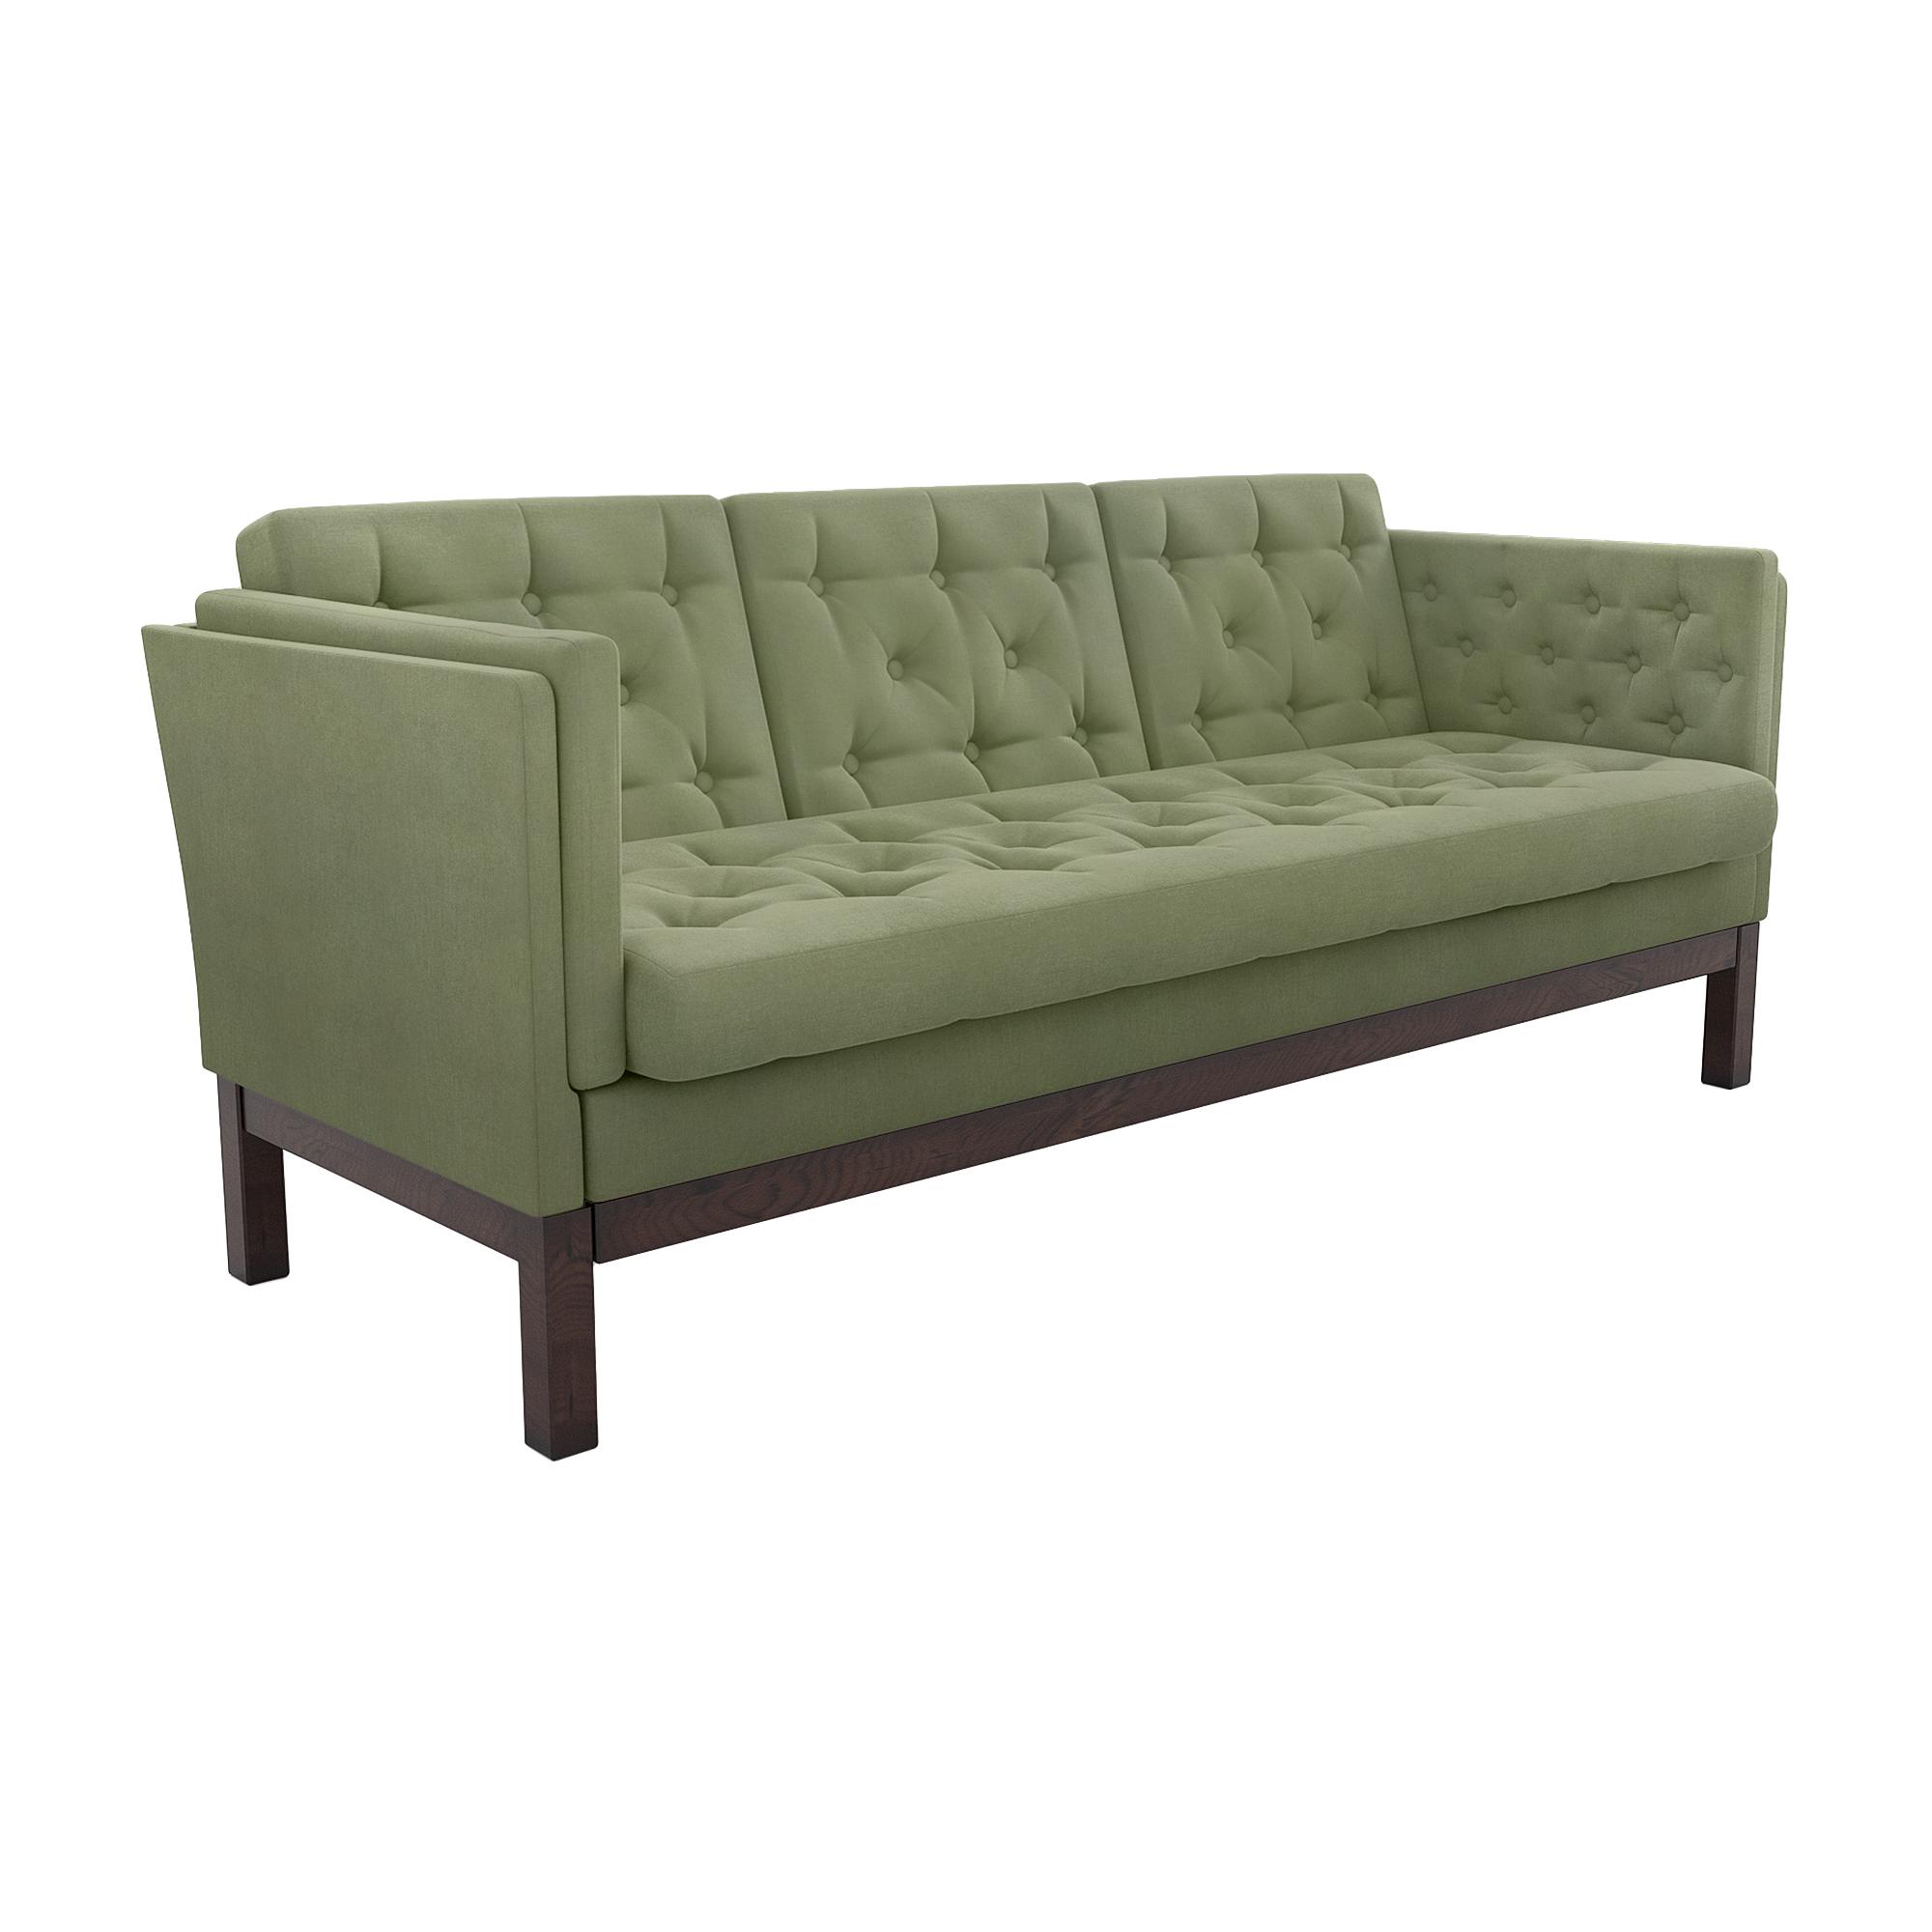 Фото - Диван AS Алана б 193x82x83 венге/зеленый диван as алана б 193x82x83 венге бейдж